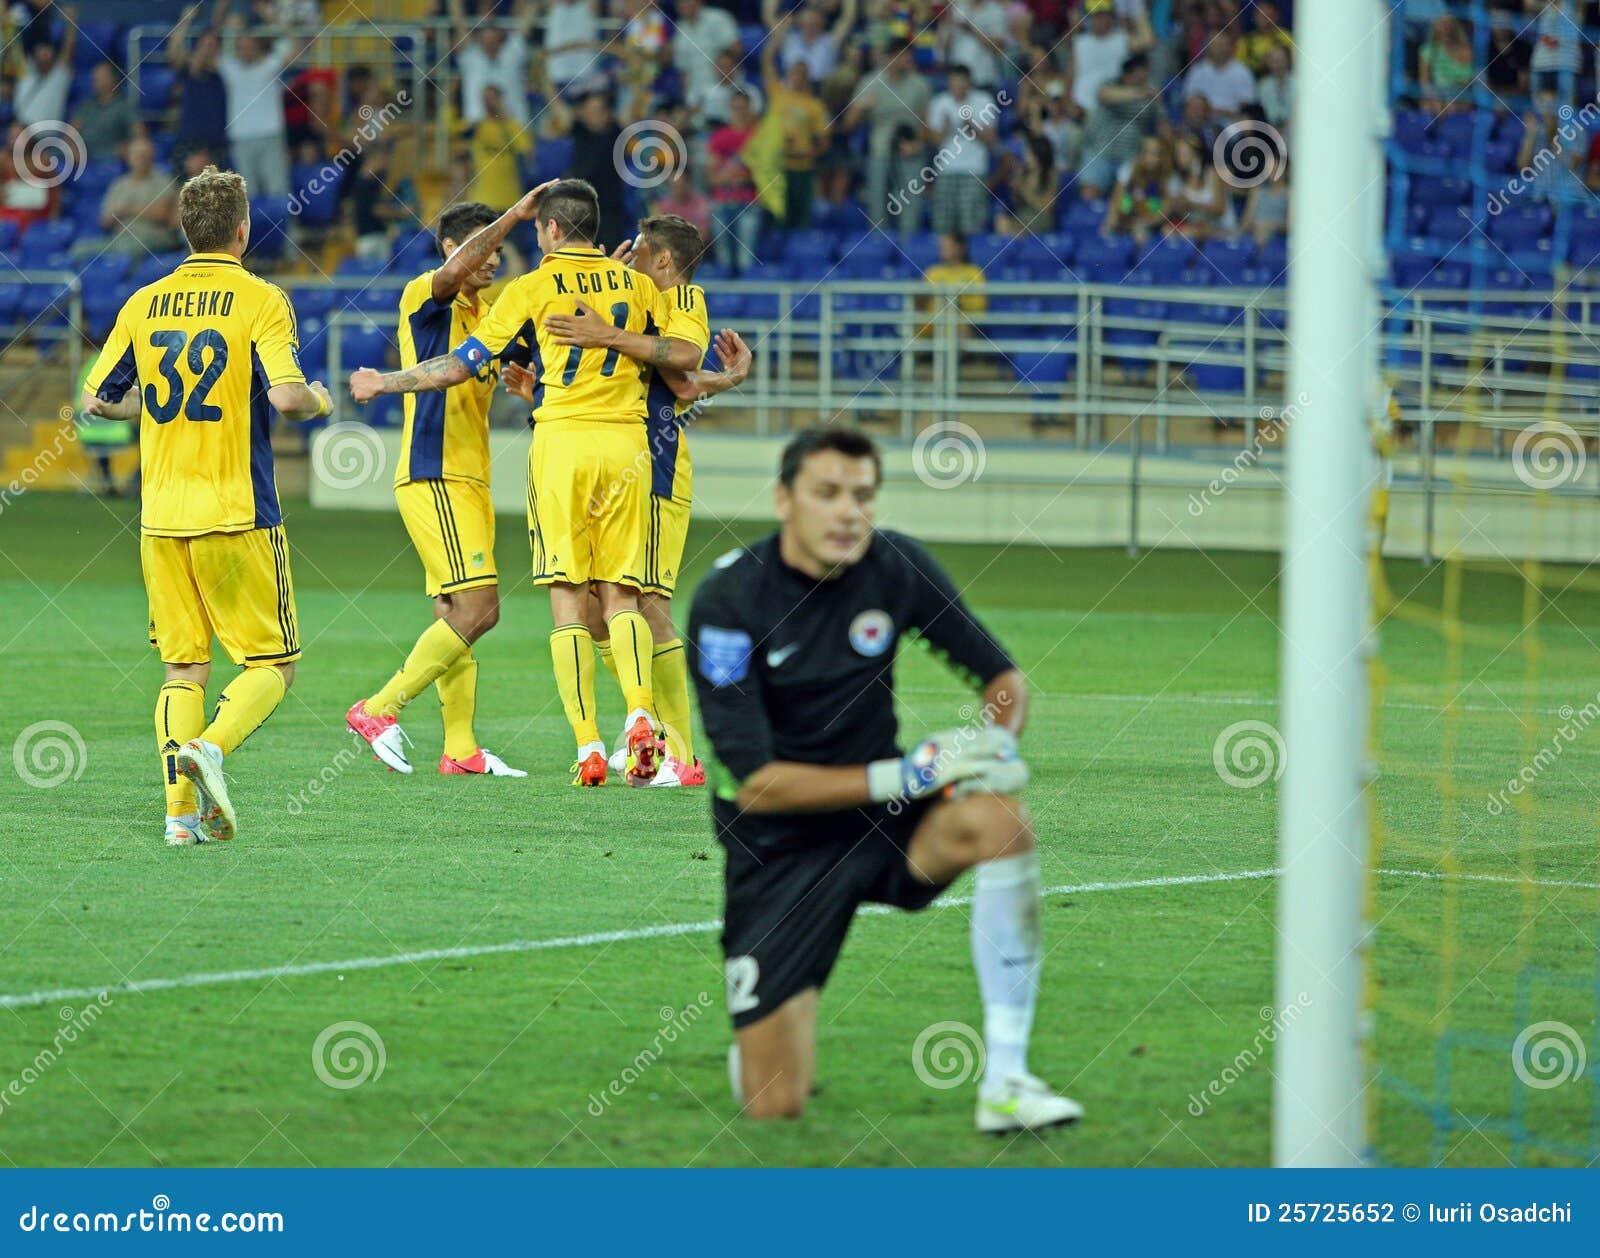 FC Metalist vs FC Illichivets soccer match